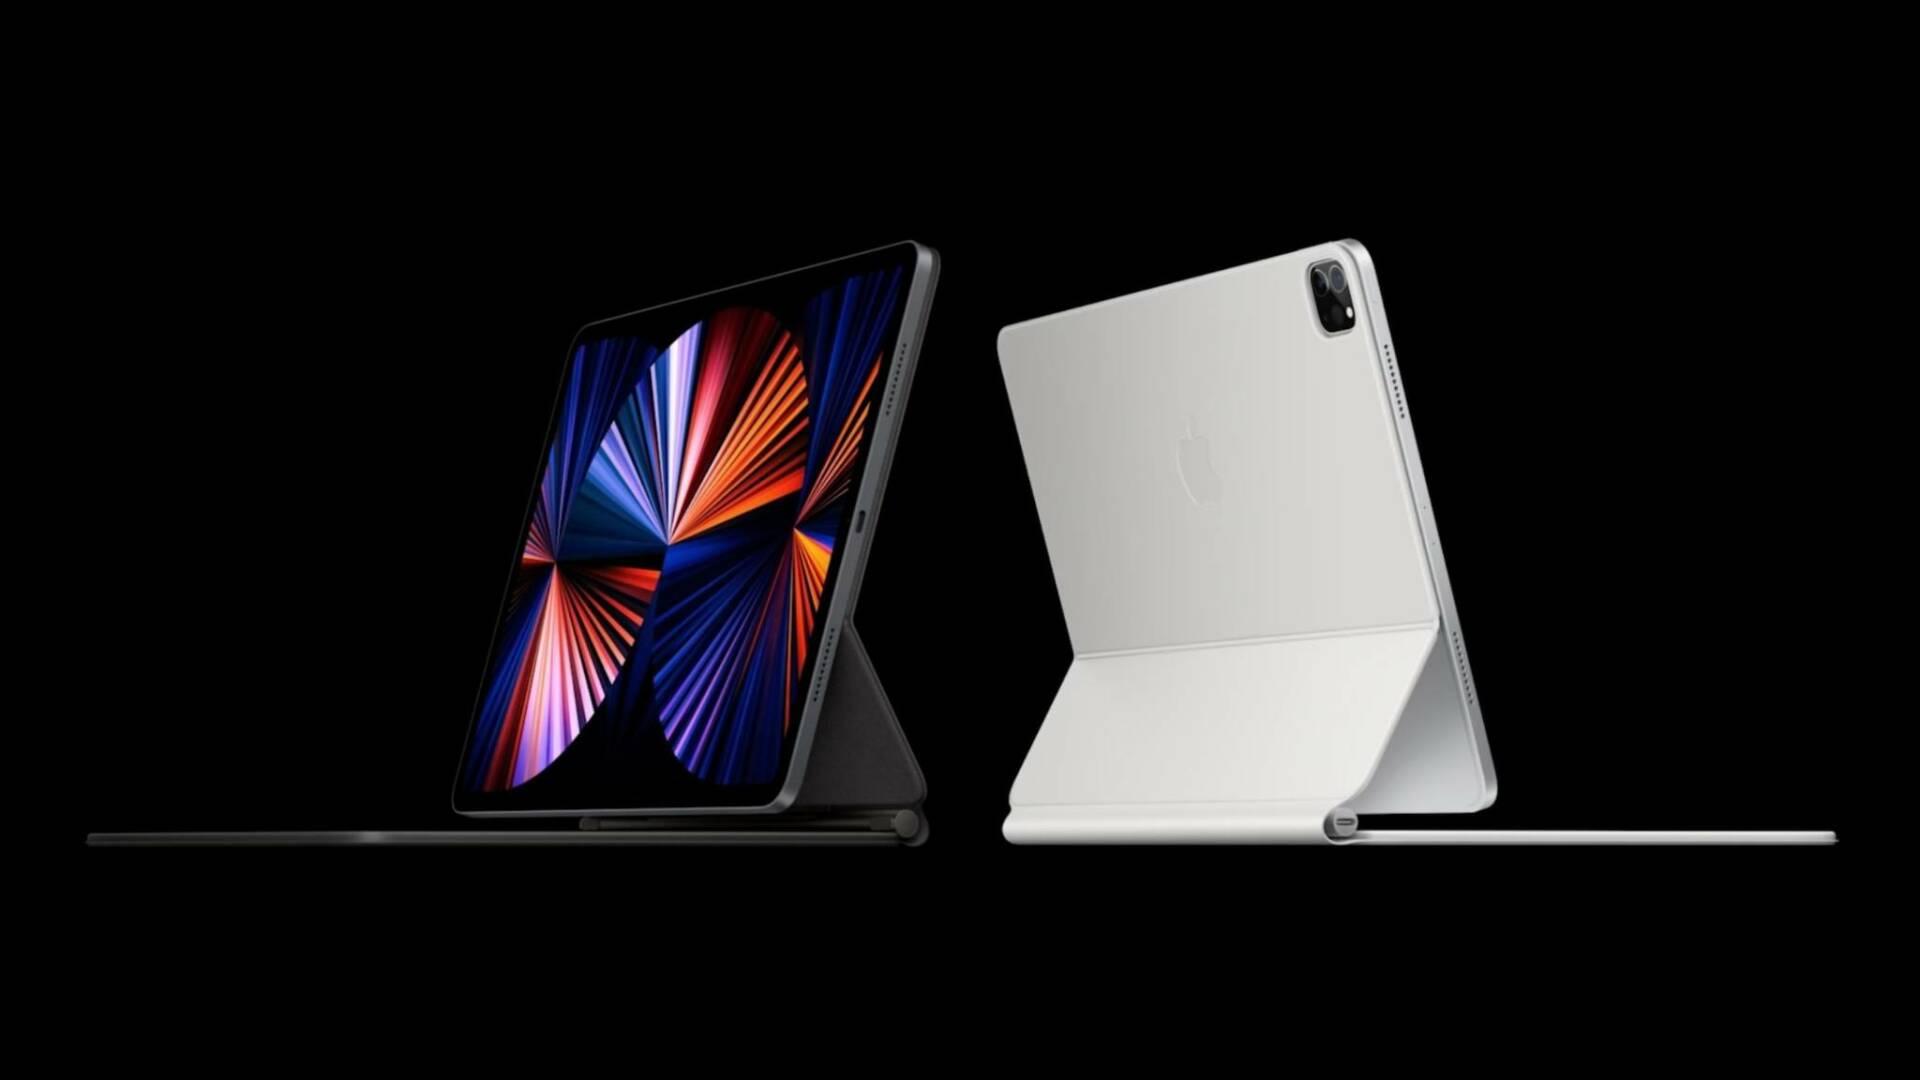 iPad Pro 2021 + Magic Keyboard